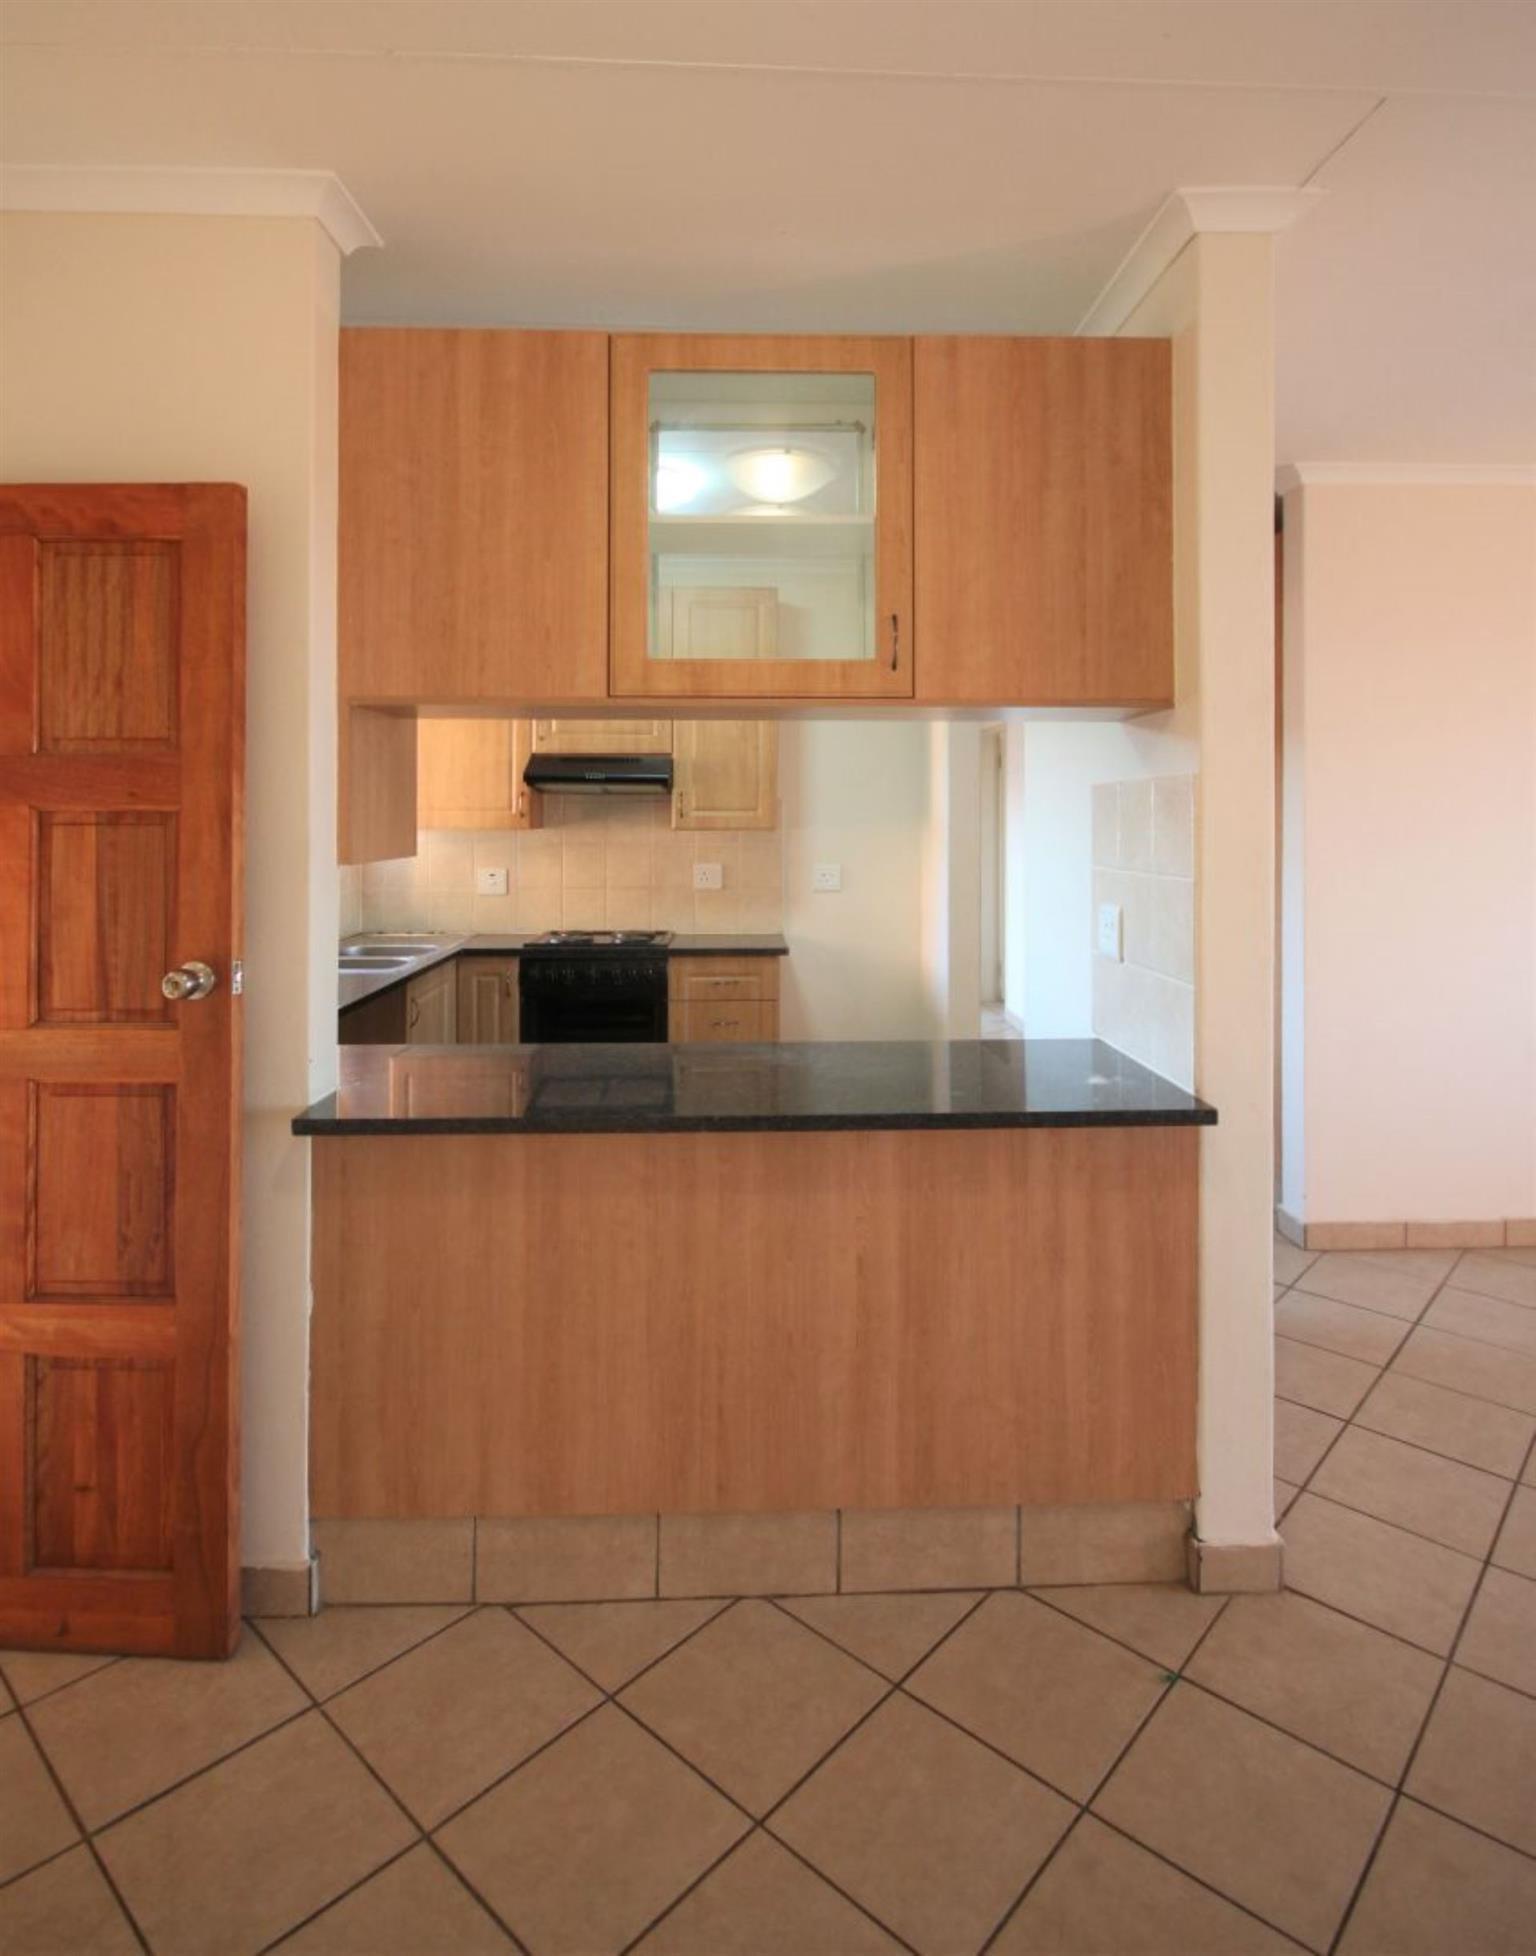 Apartment Rental Monthly in Hazeldean